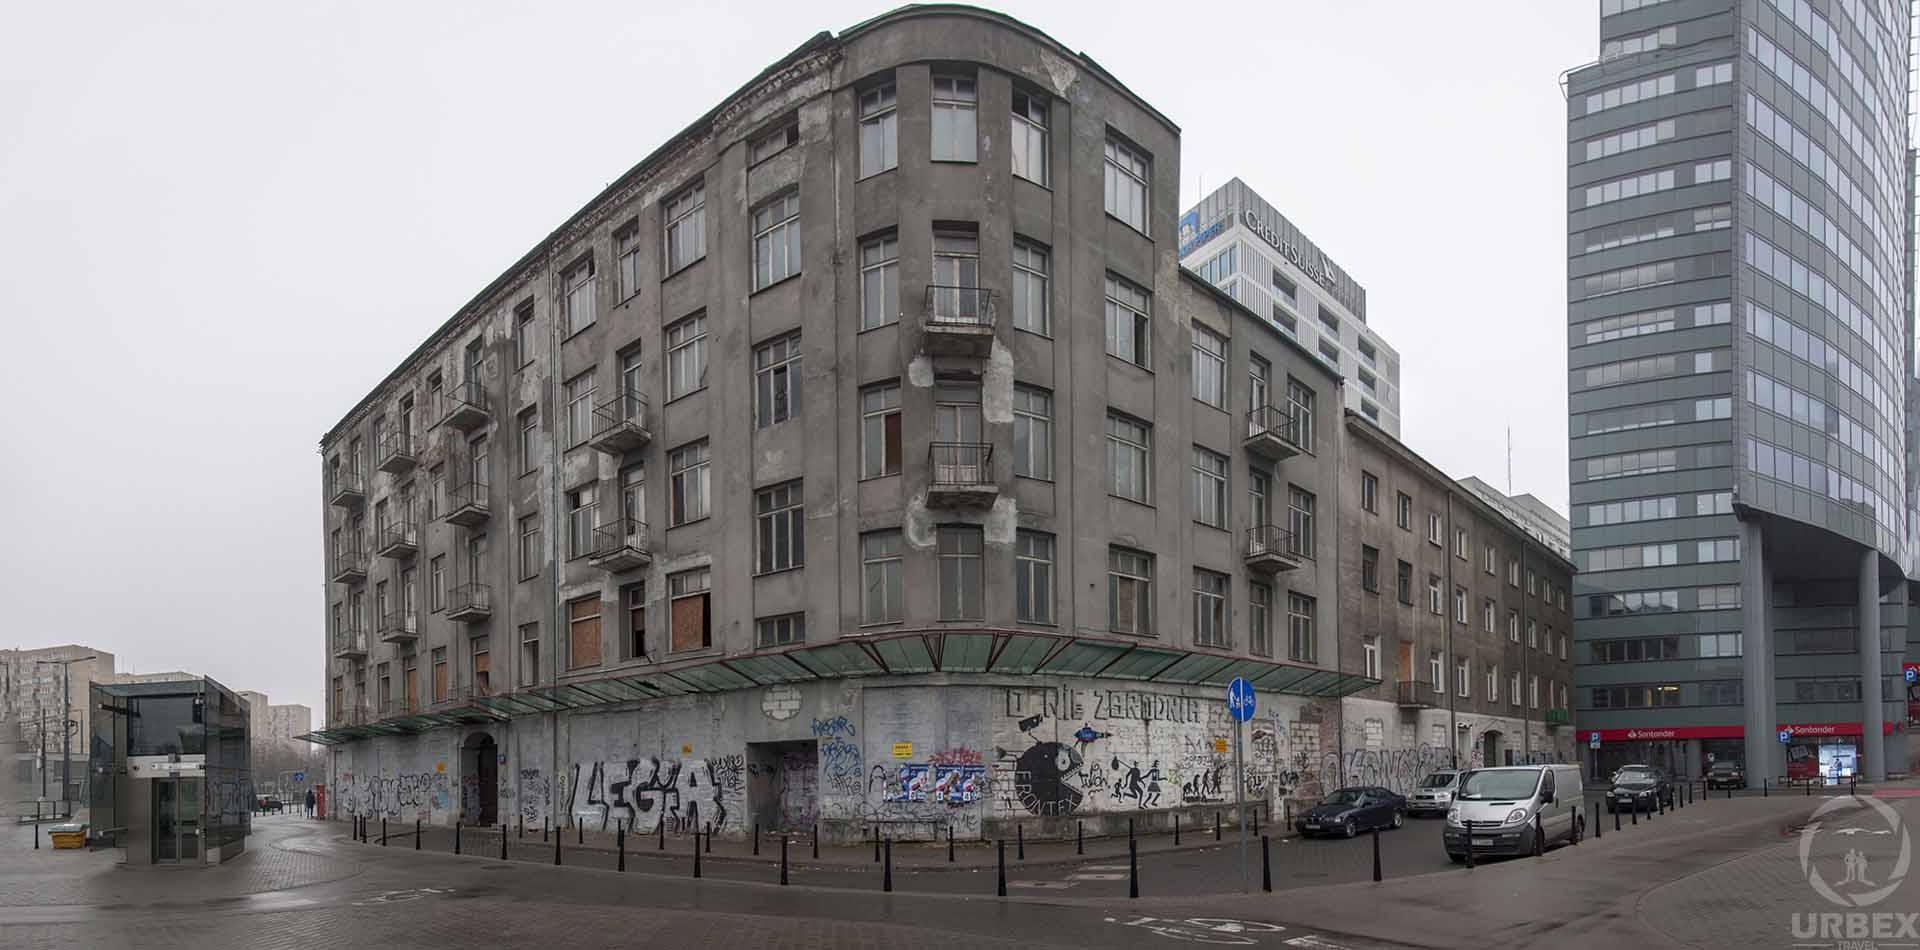 Abandoned Jewish Tenemet House Warsaw